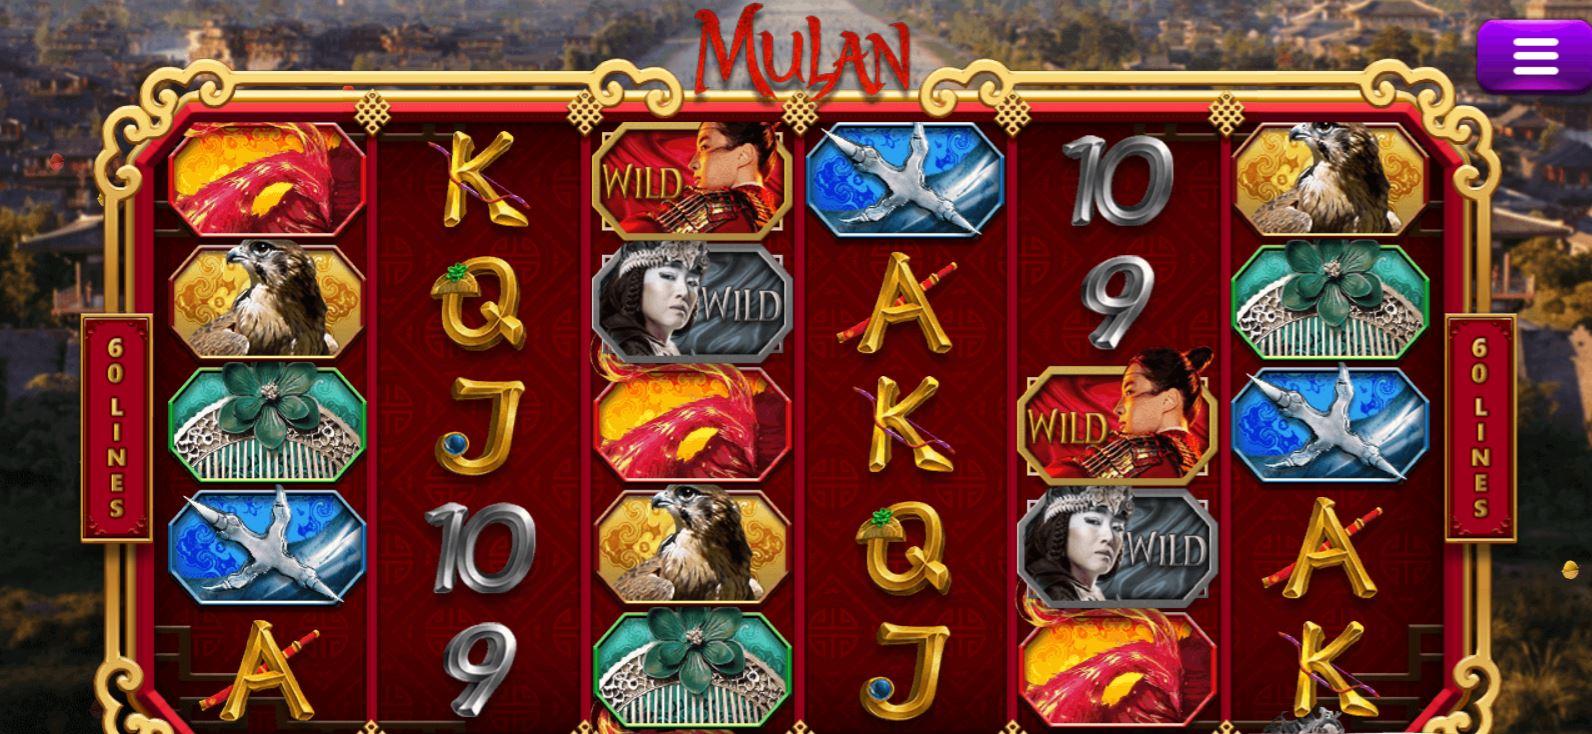 Epicwin โปรโมชั่นเครดิต Free | ทางเข้าเกมสล็อต Mulan 2021